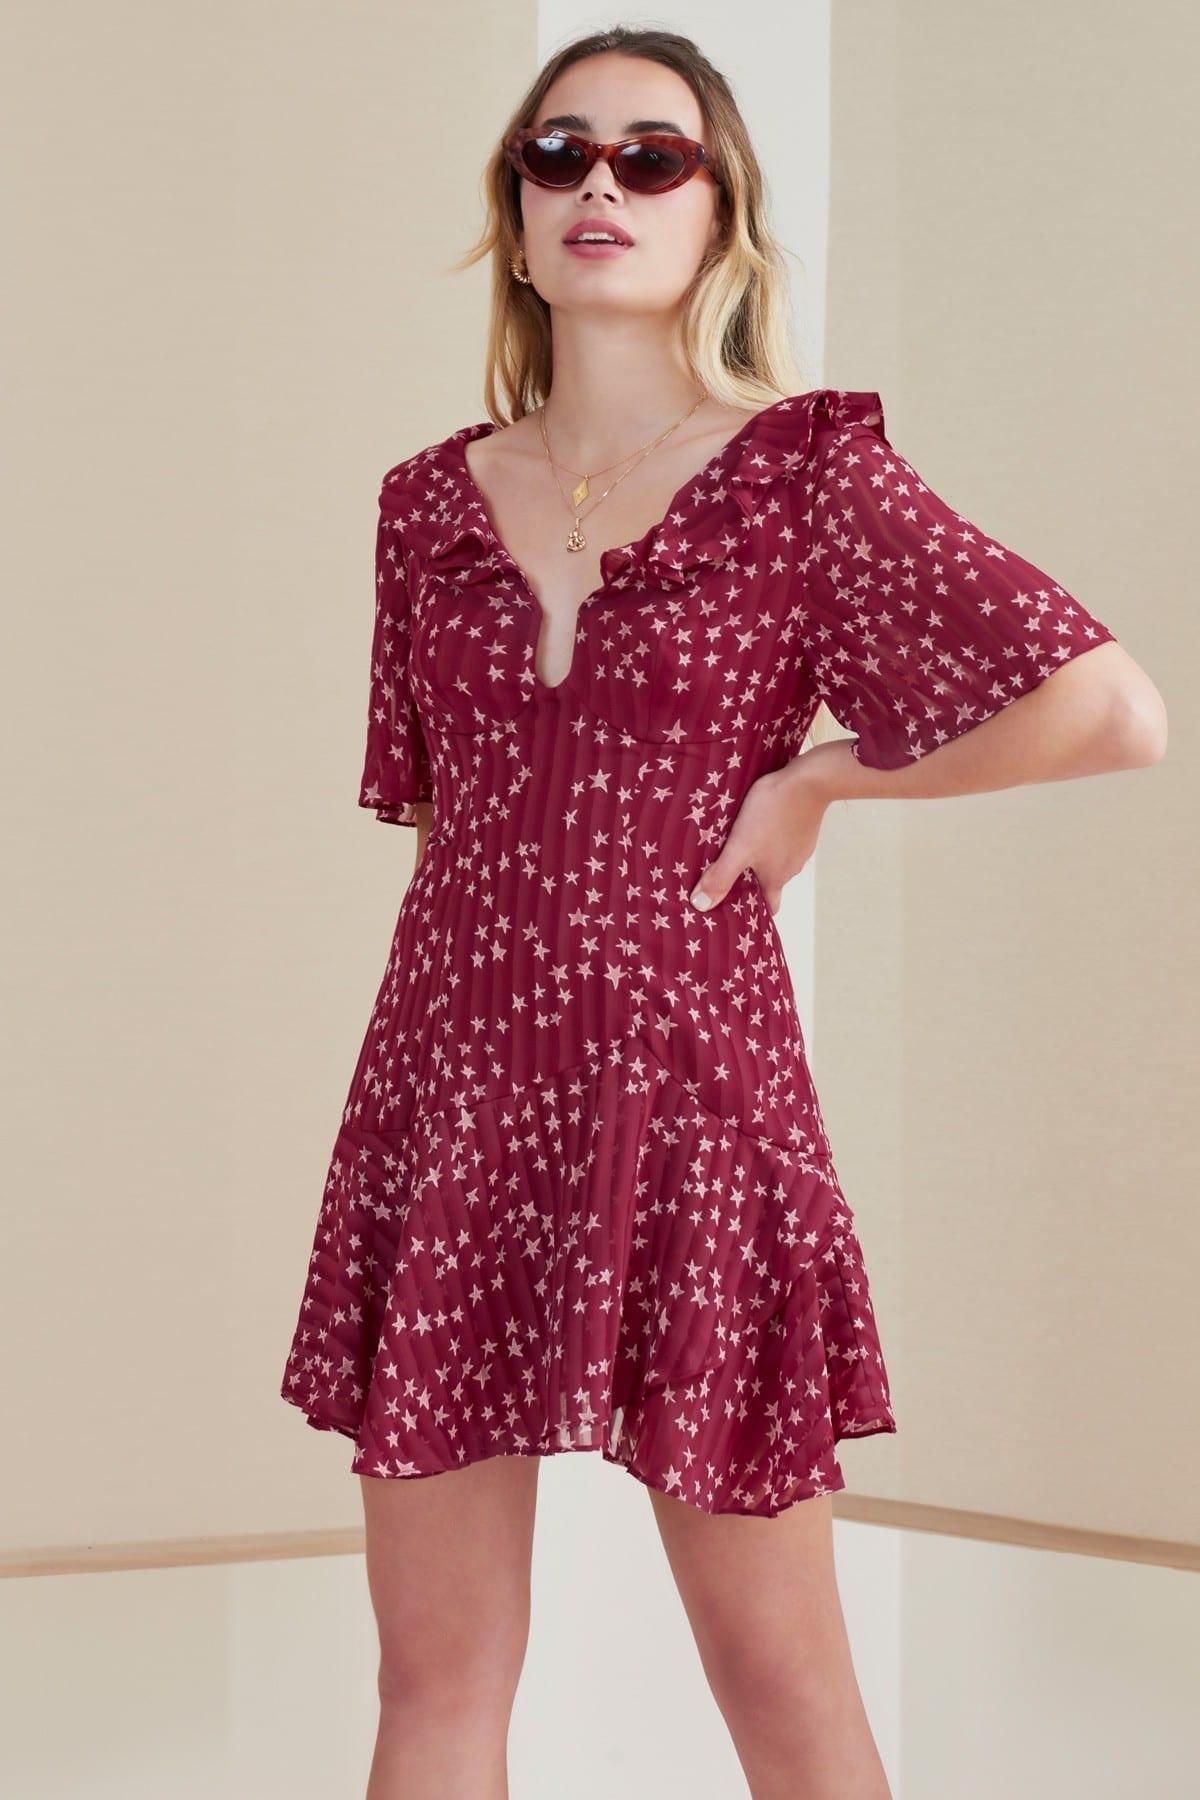 FINDERS KEEPERS Twilight Mini Cherry / Star Printed Dress